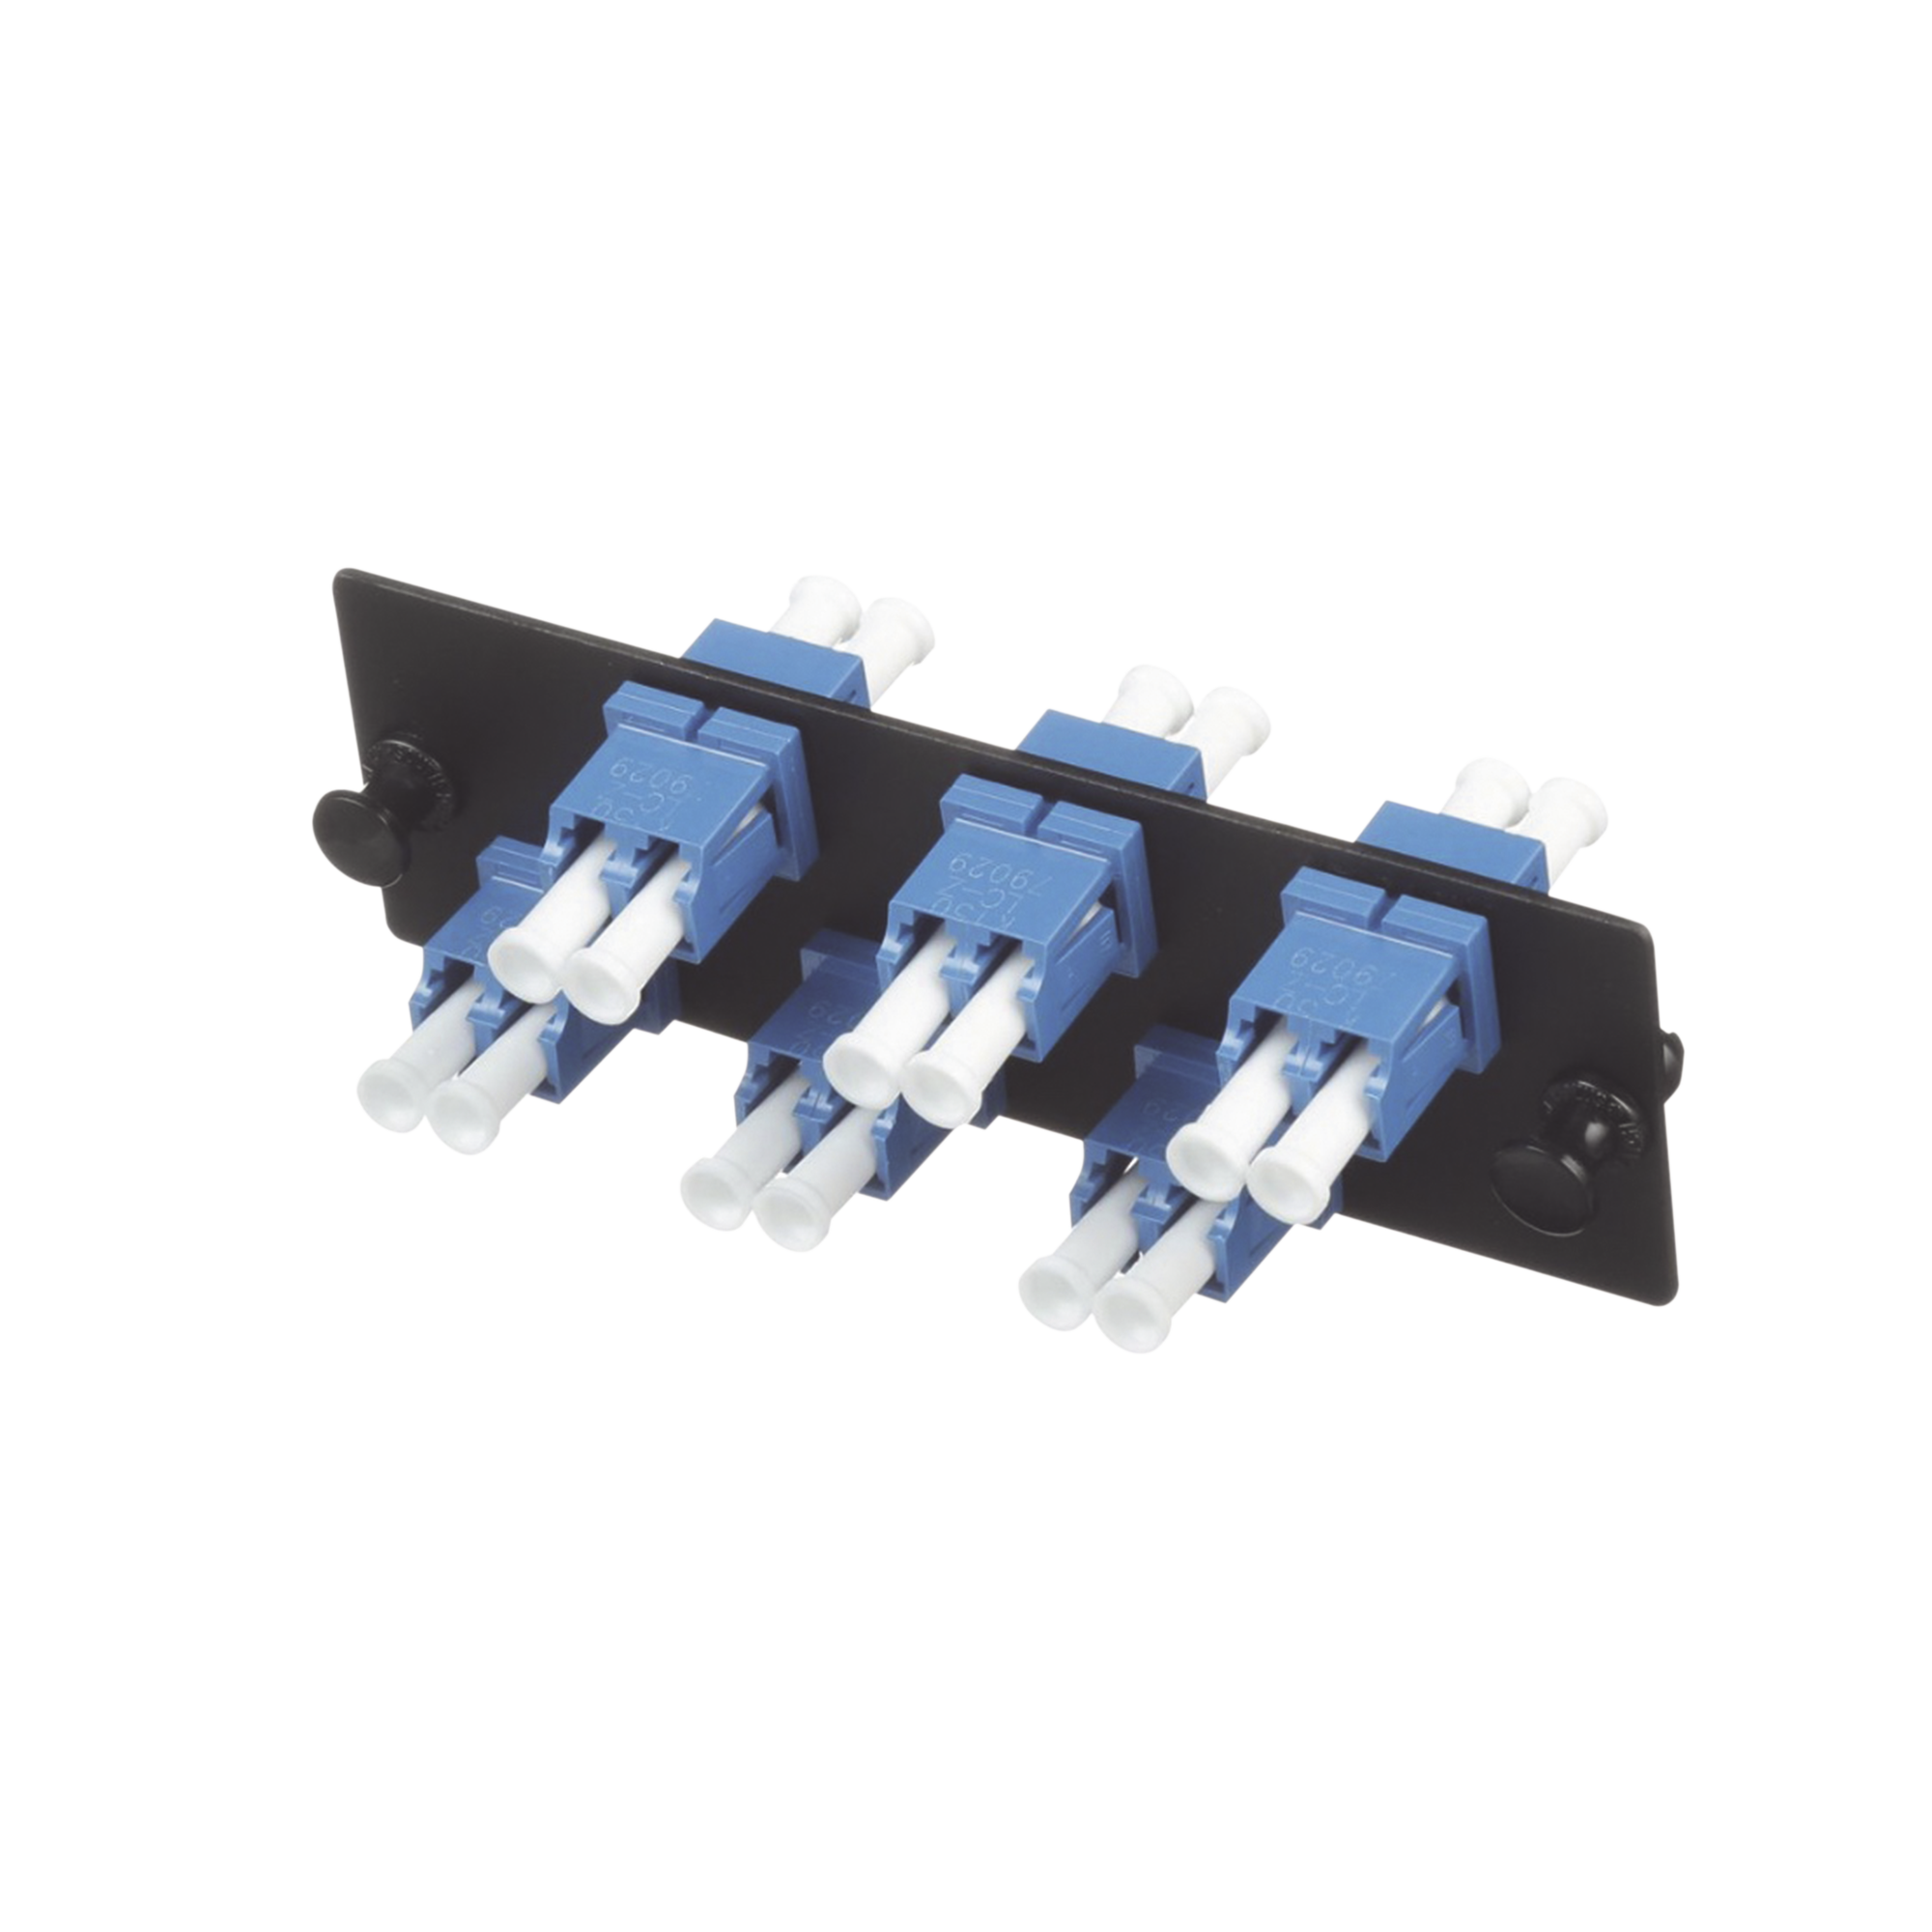 Placa Acopladora de Fibra Optica FAP, Con 6 Conectores LC Duplex (12 Fibras), Para Fibra Monomodo OS1/OS2, Color Azul